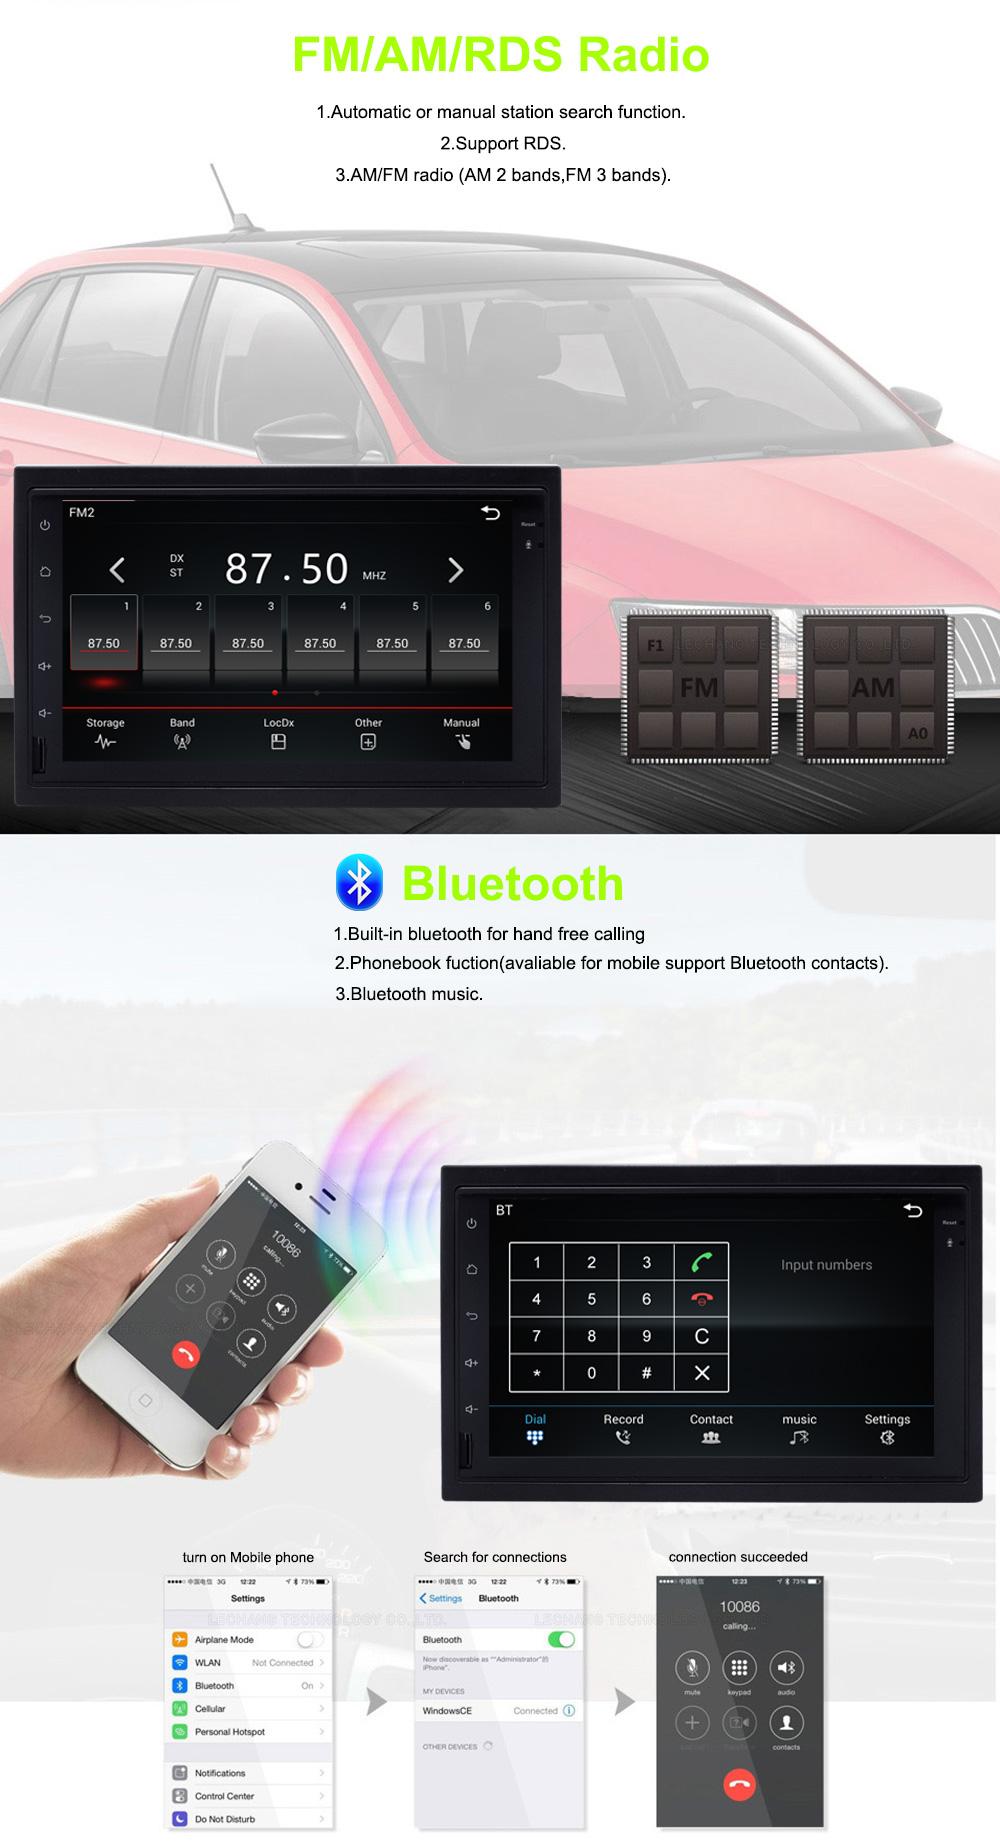 4G SIM LTE Network Ownice C500 Octa 8 Core Android 6.0 2G RAM 2 Din Car DVD GPS Navi Radio Player For VW Skoda Octavia 2 obd